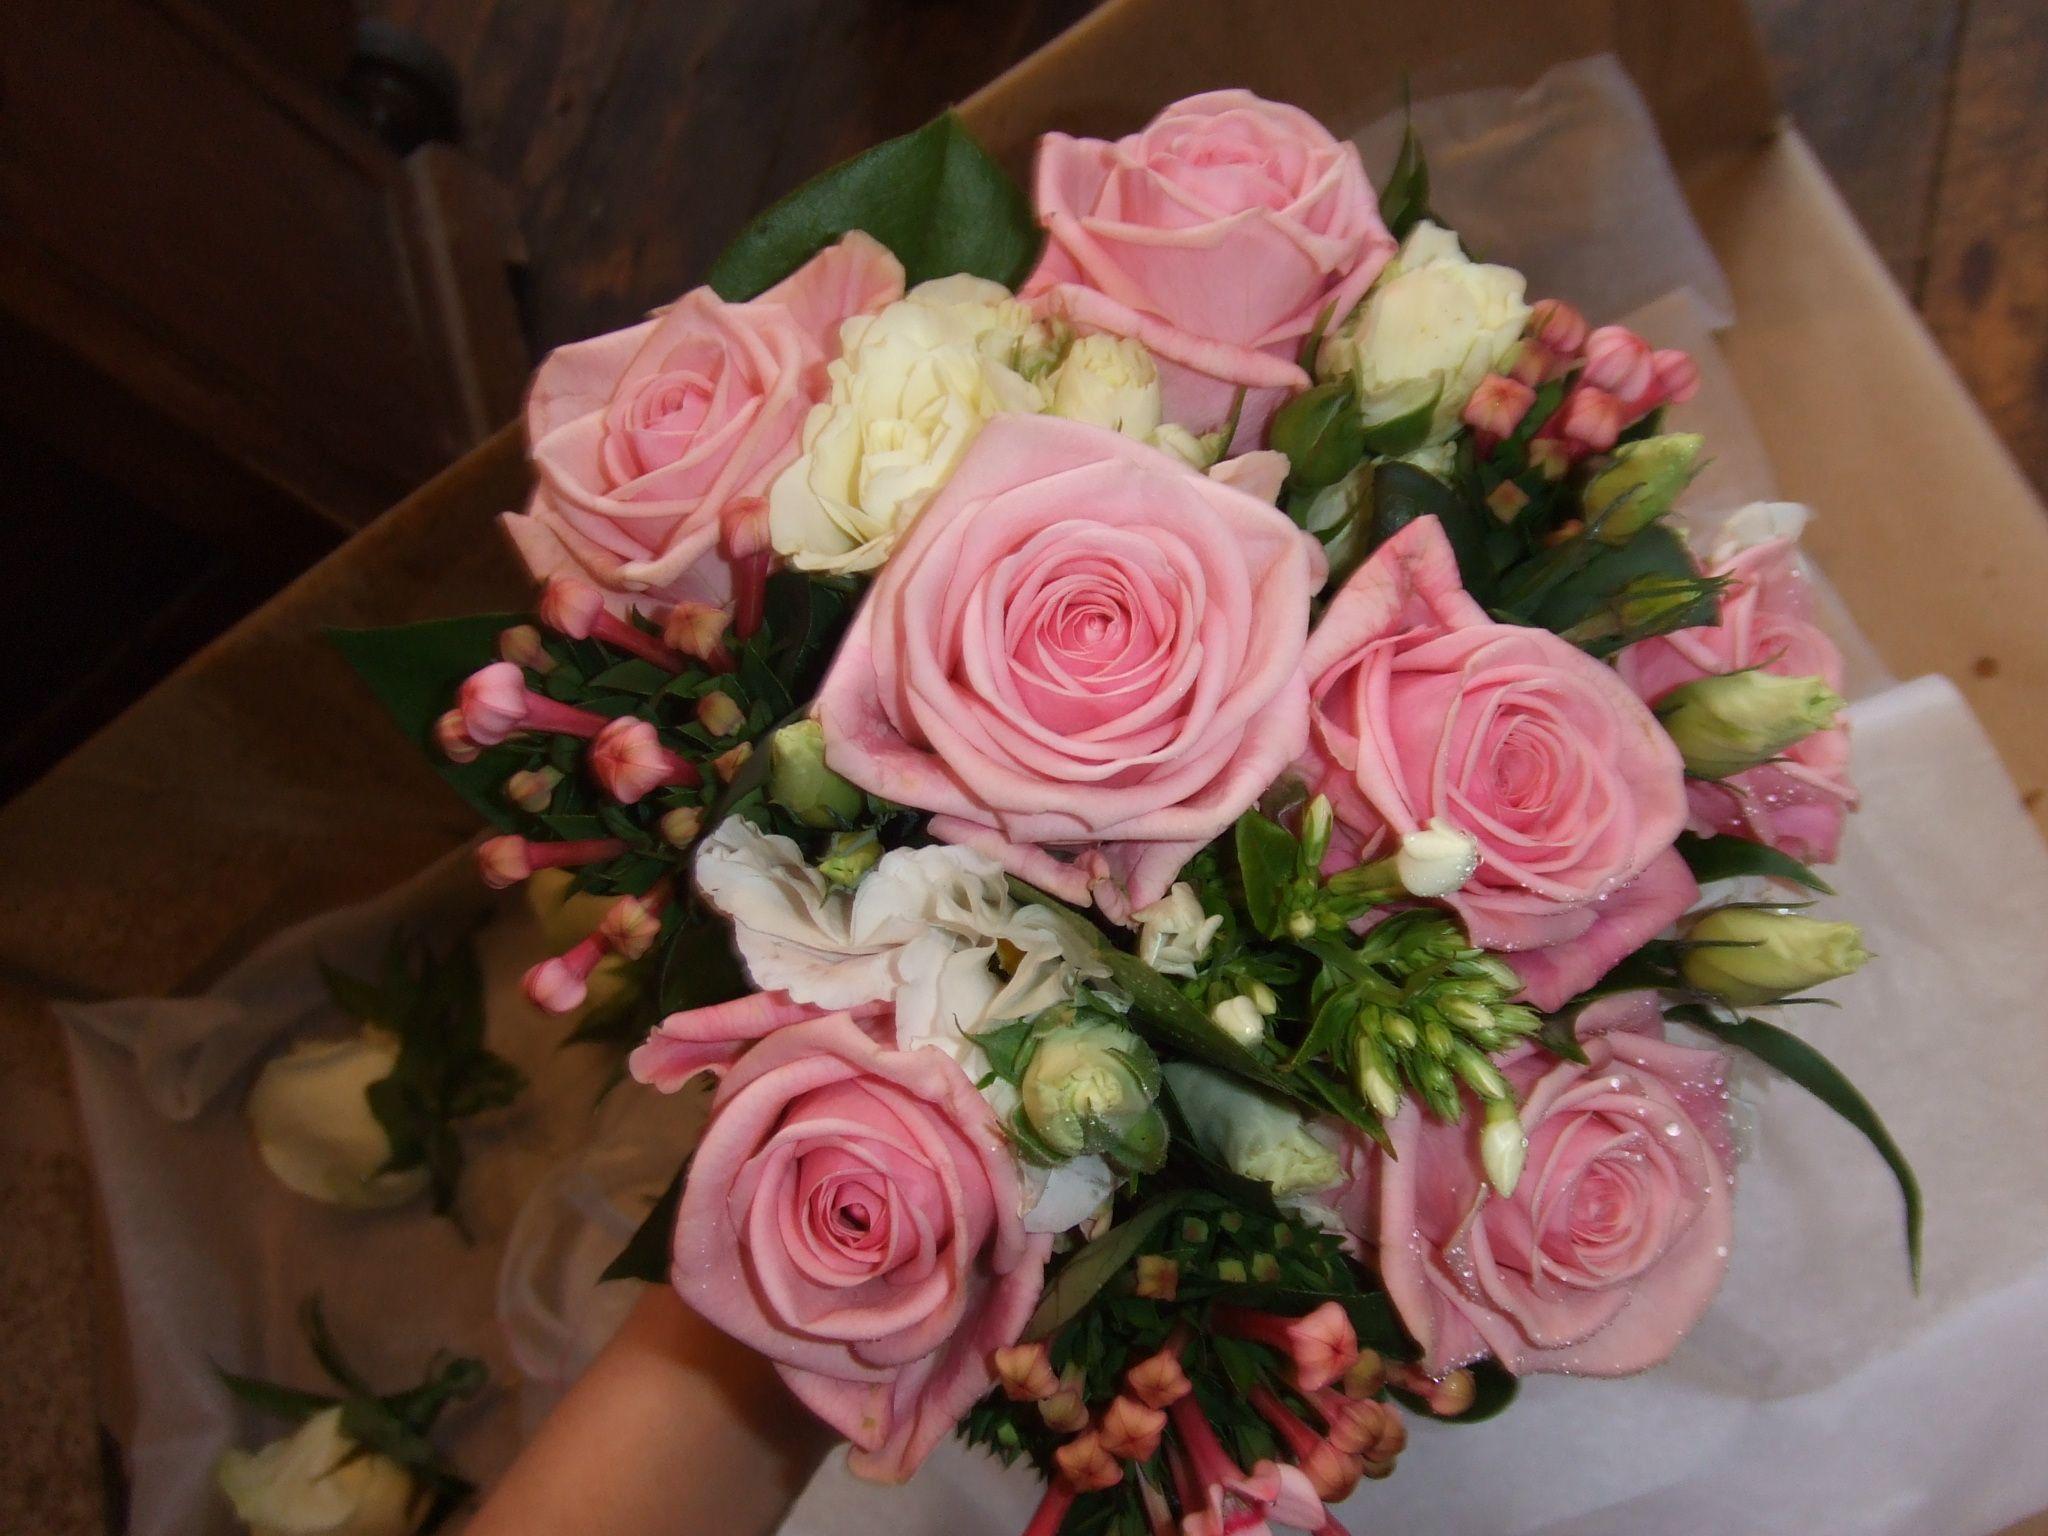 Pink Heaven Roses Bouvardia Spray White Roses Wedding Hand Tie White Roses Wedding Wedding Hands Rose Wedding